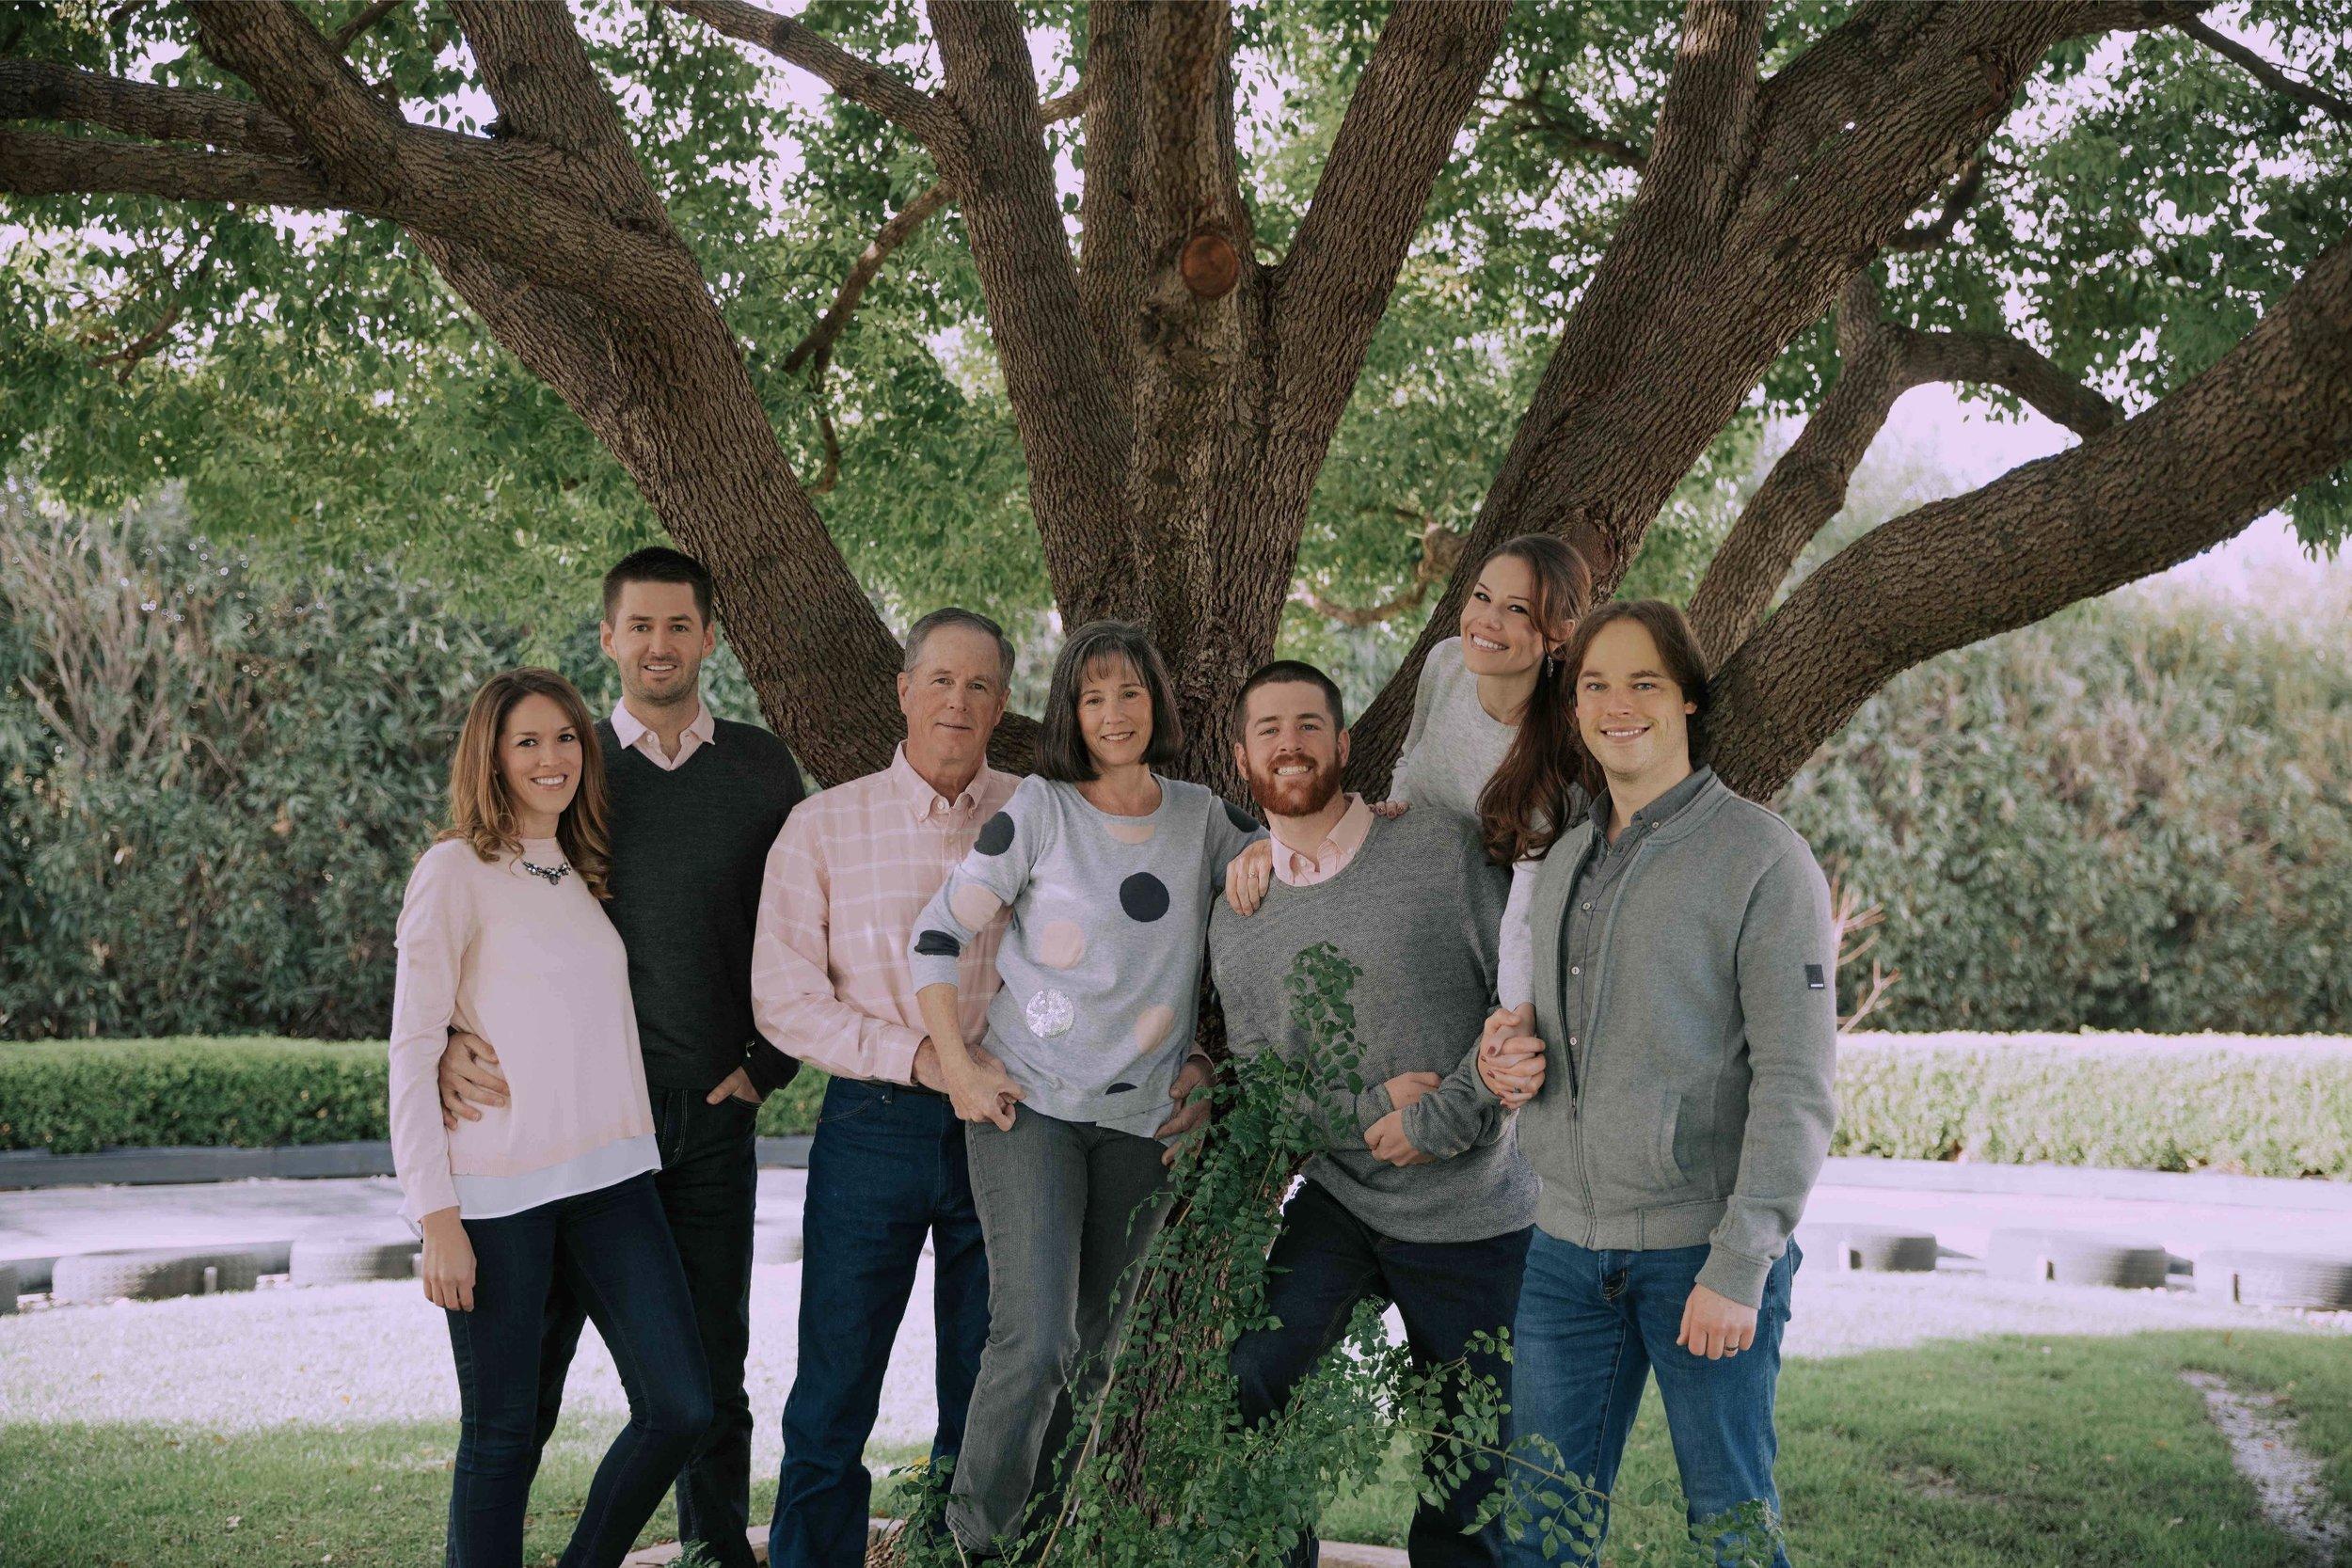 Chico California Family Photographer 8.jpg